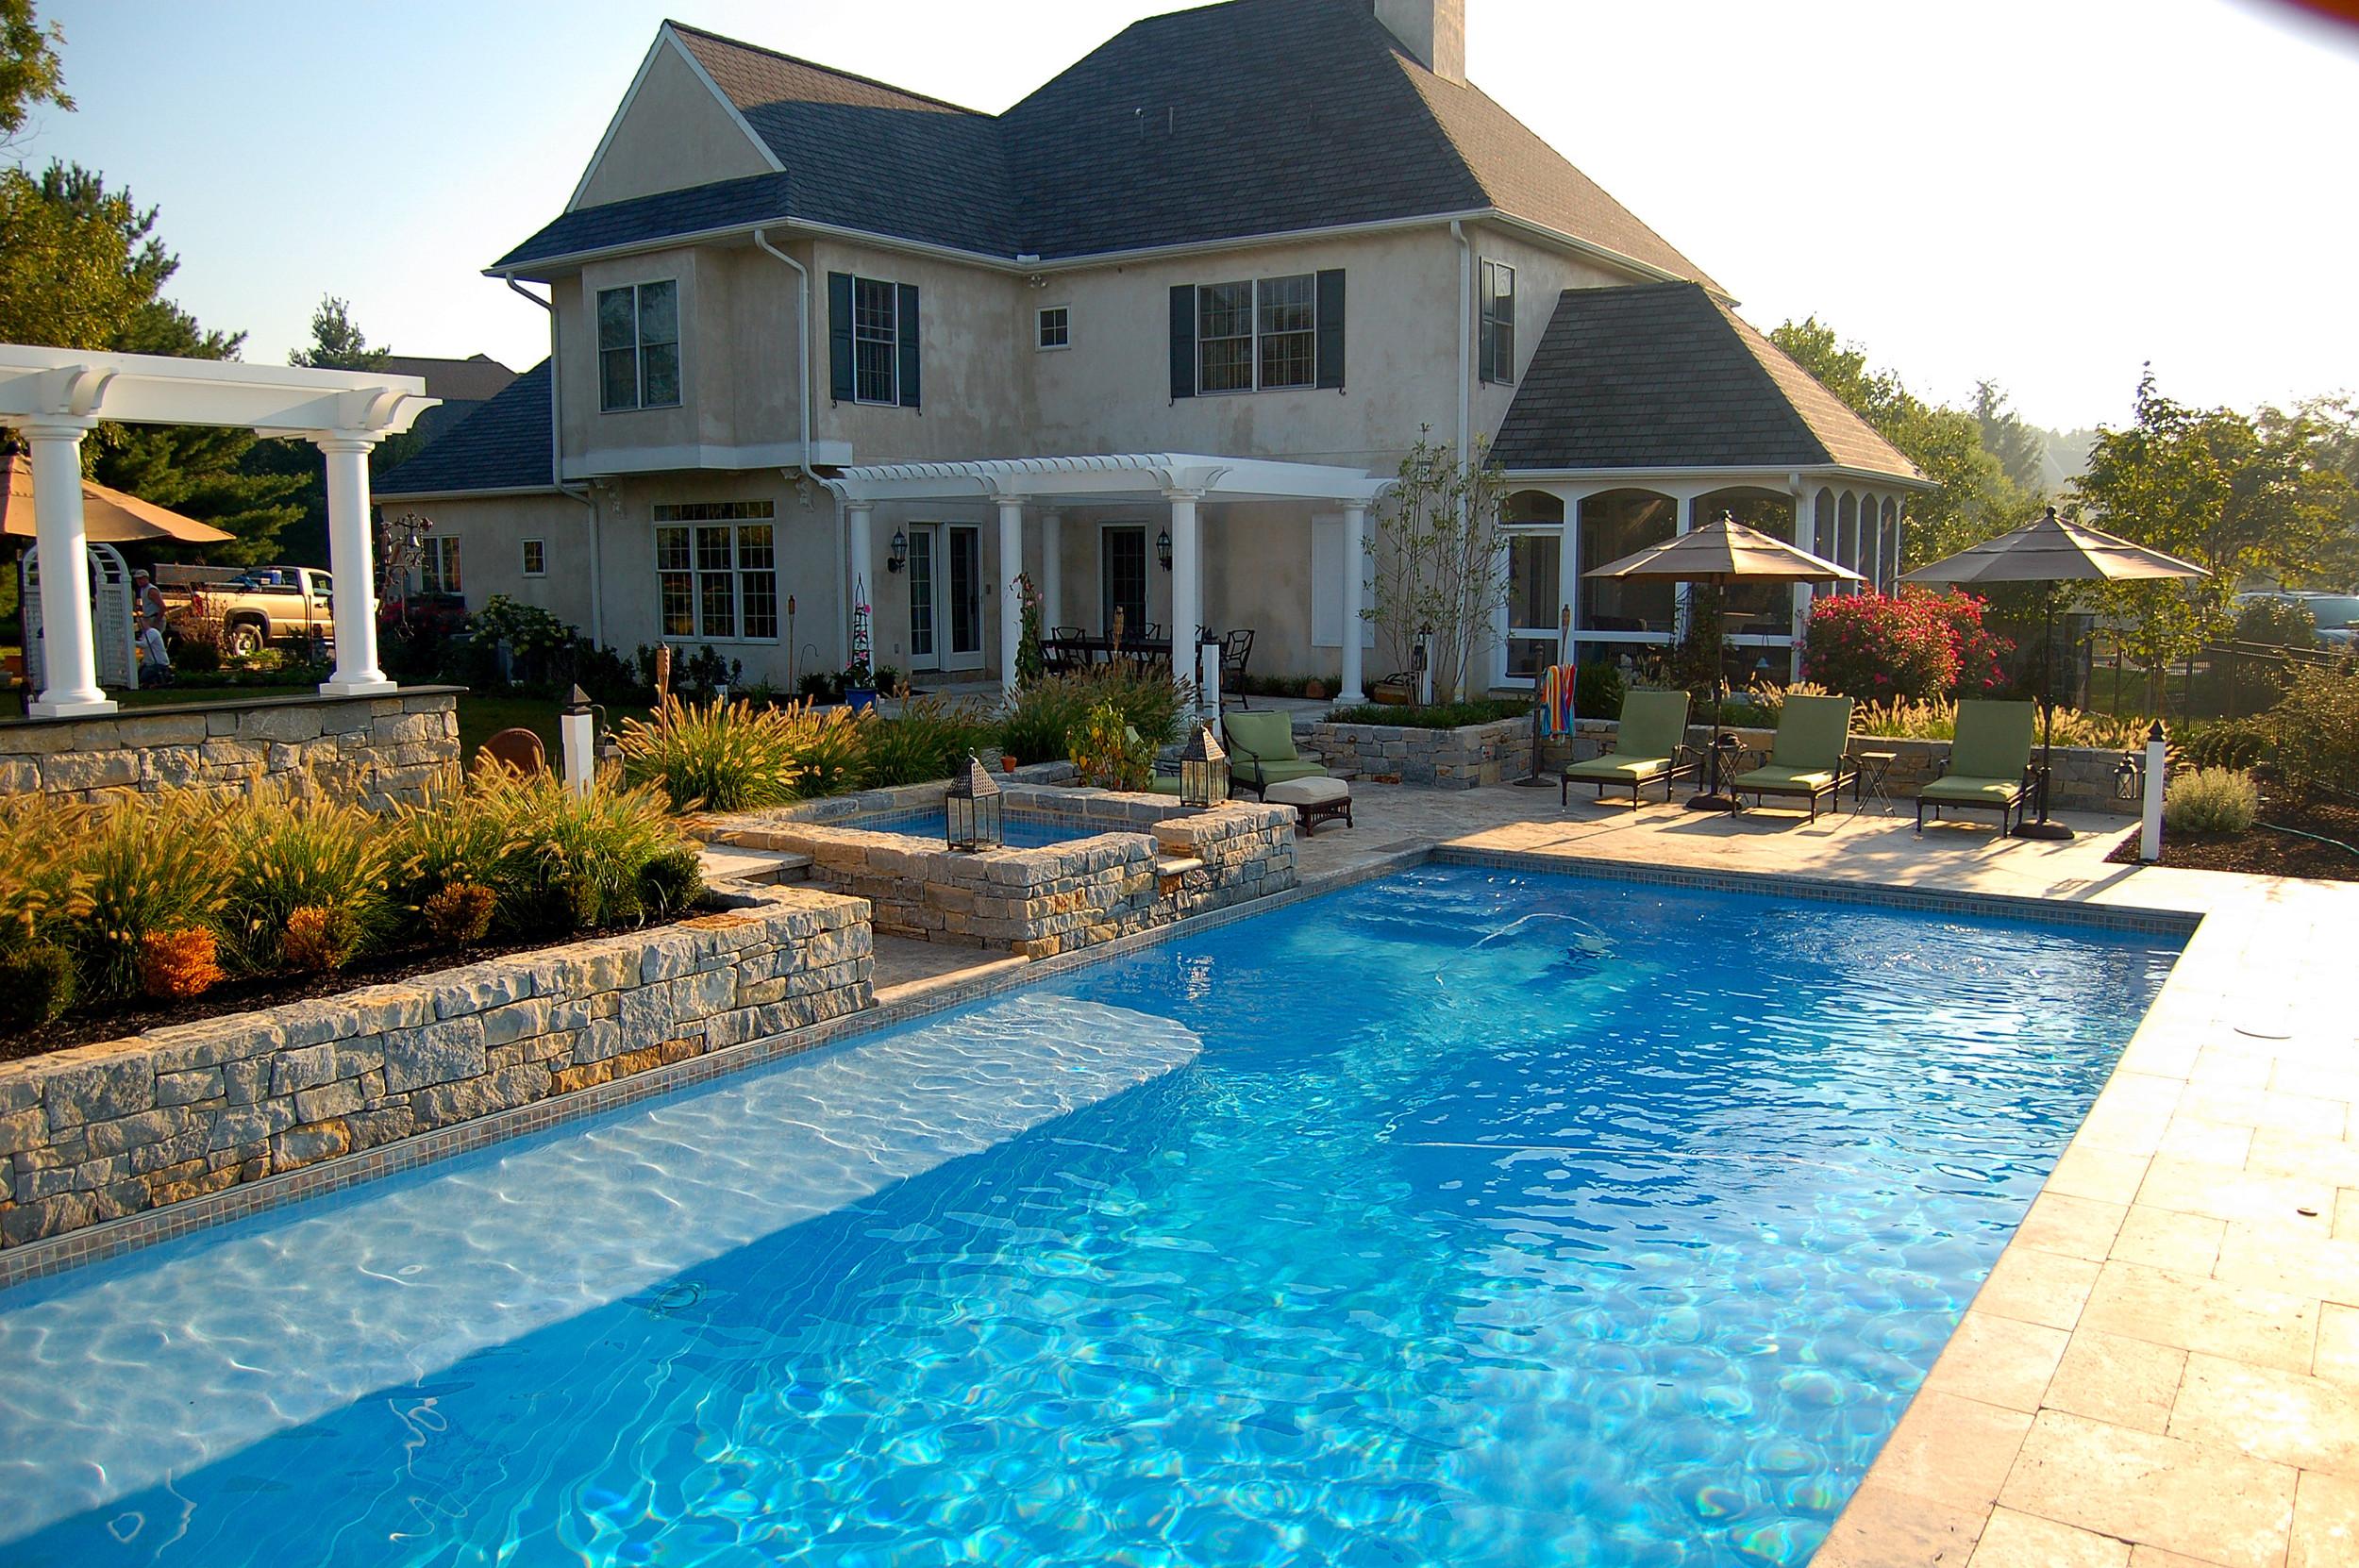 Landscape Design and Pool Lancaster, PA